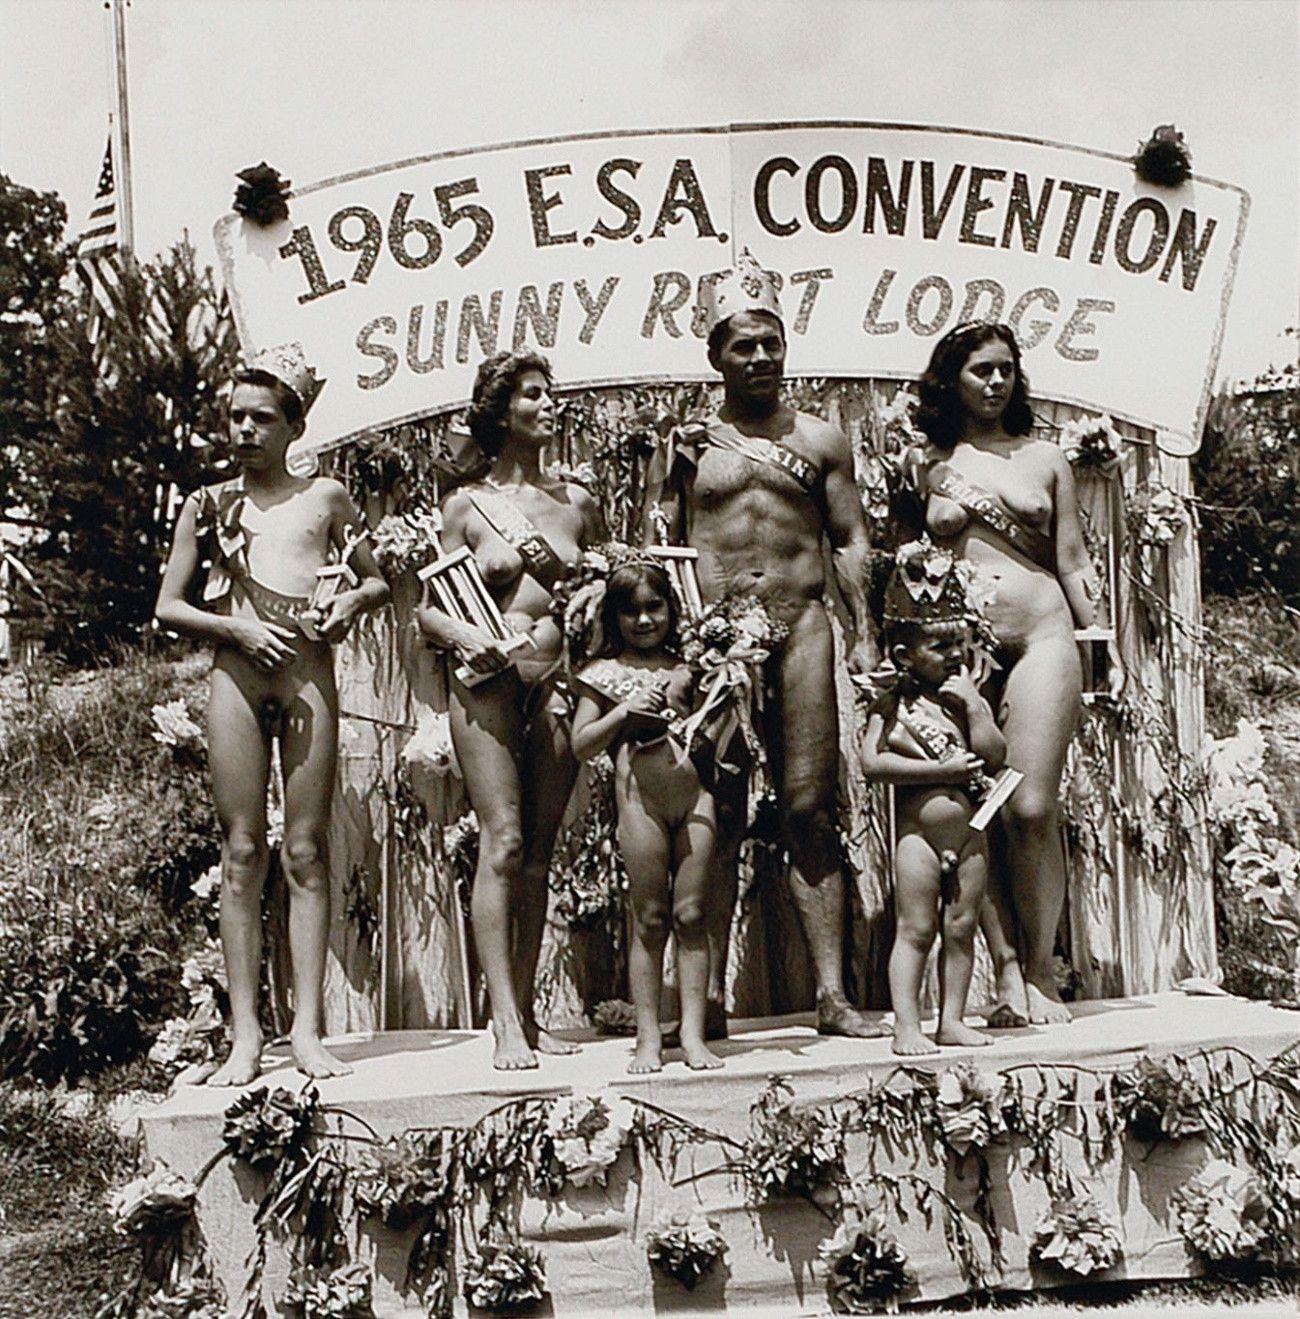 Family nudist camp